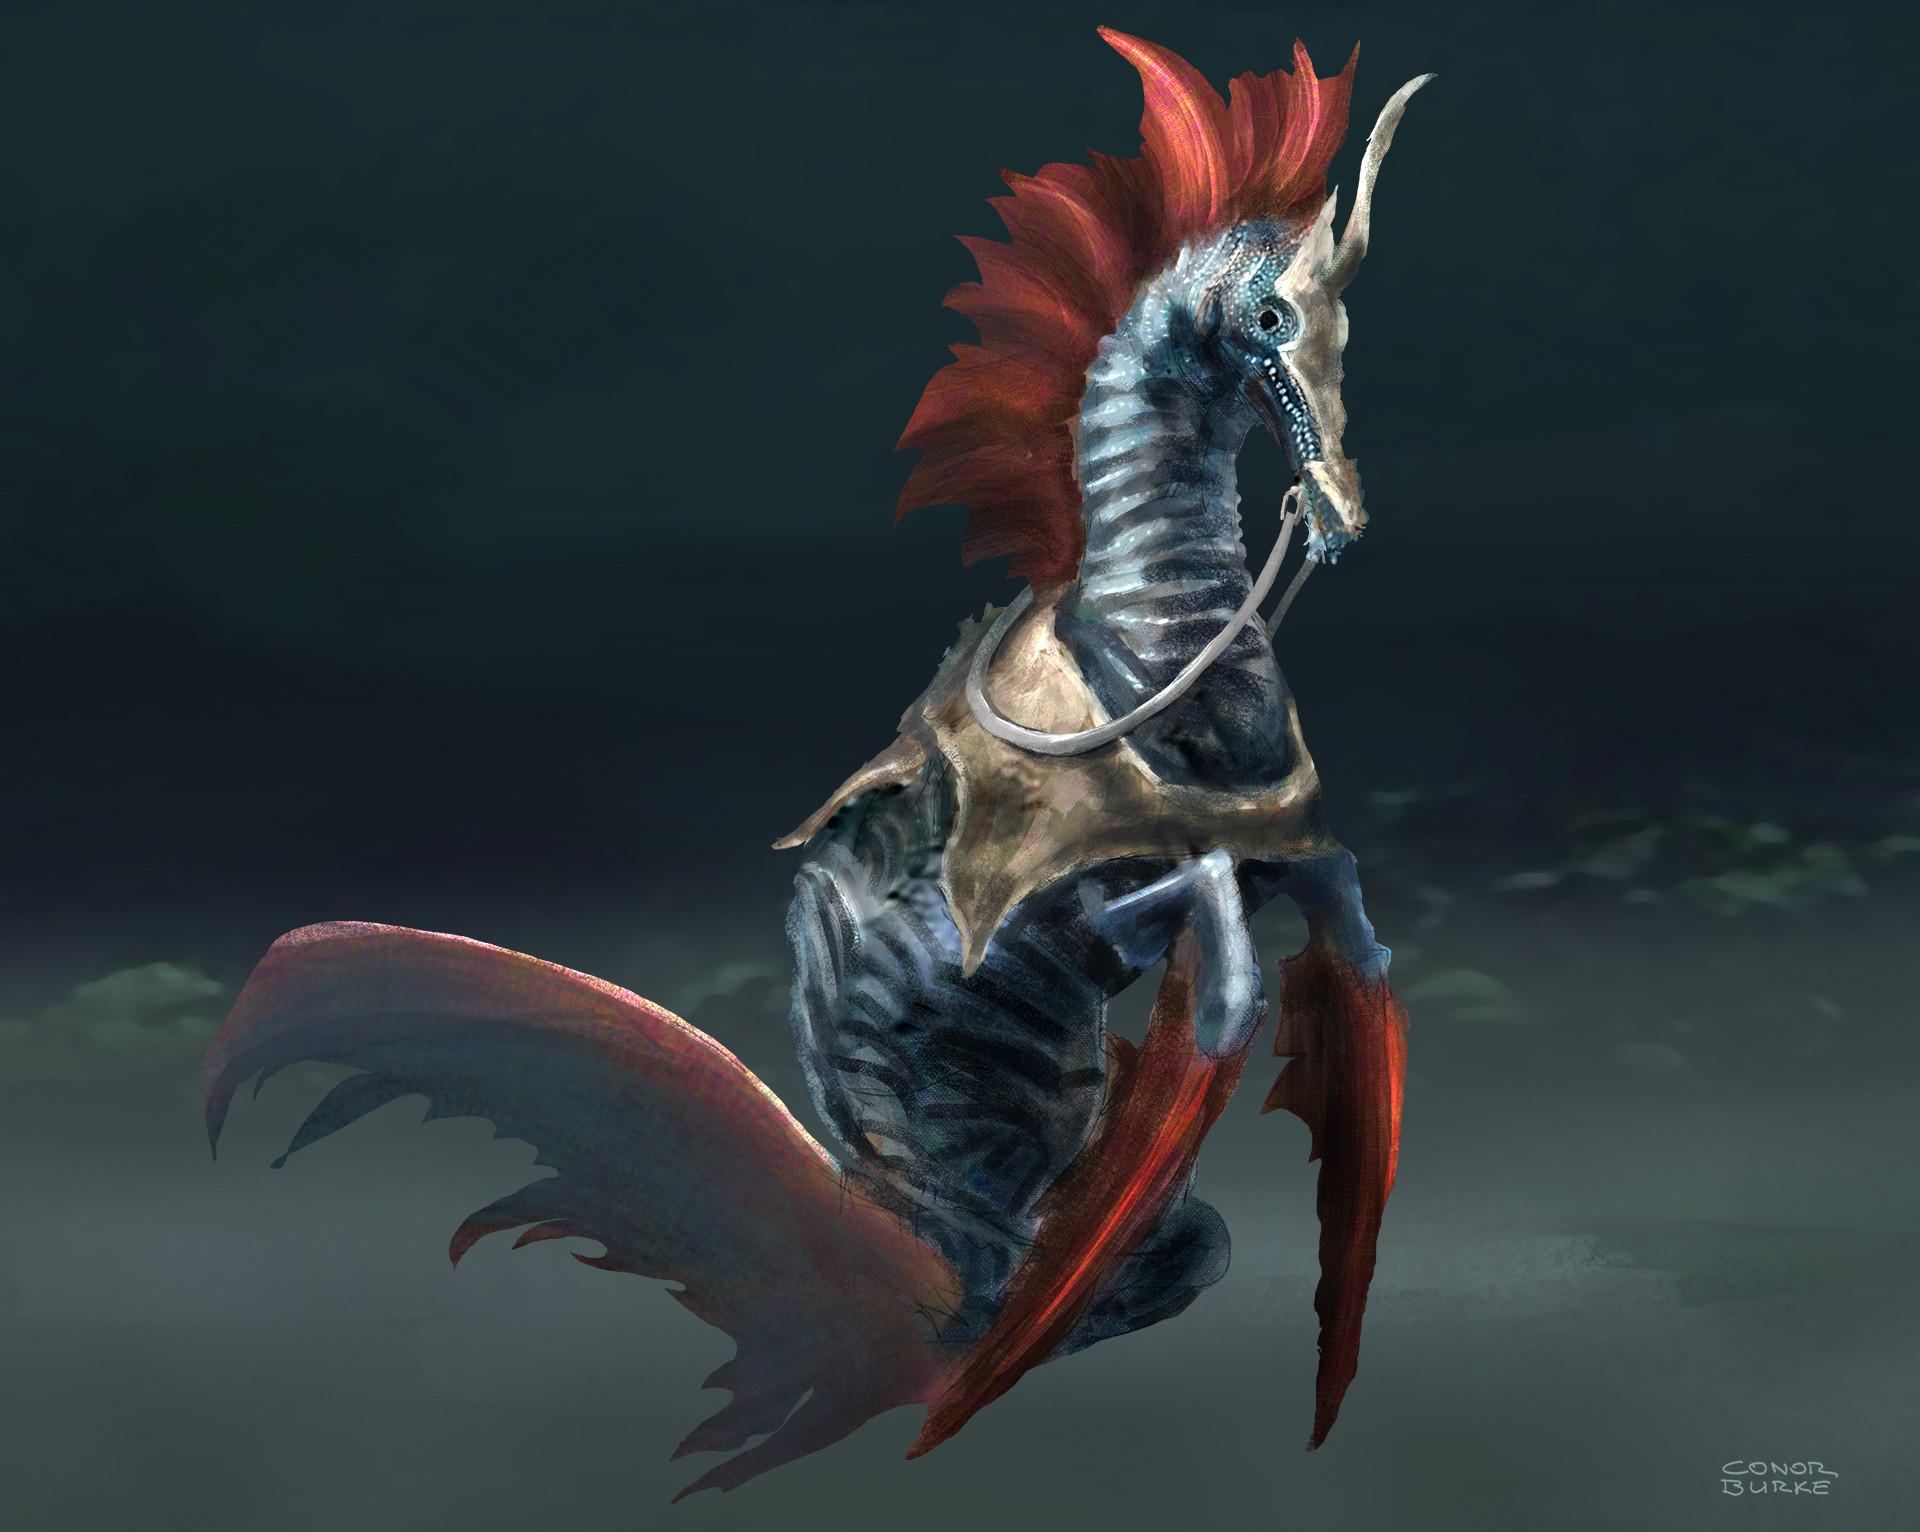 Conor burke conor burke btw denizen seahorse